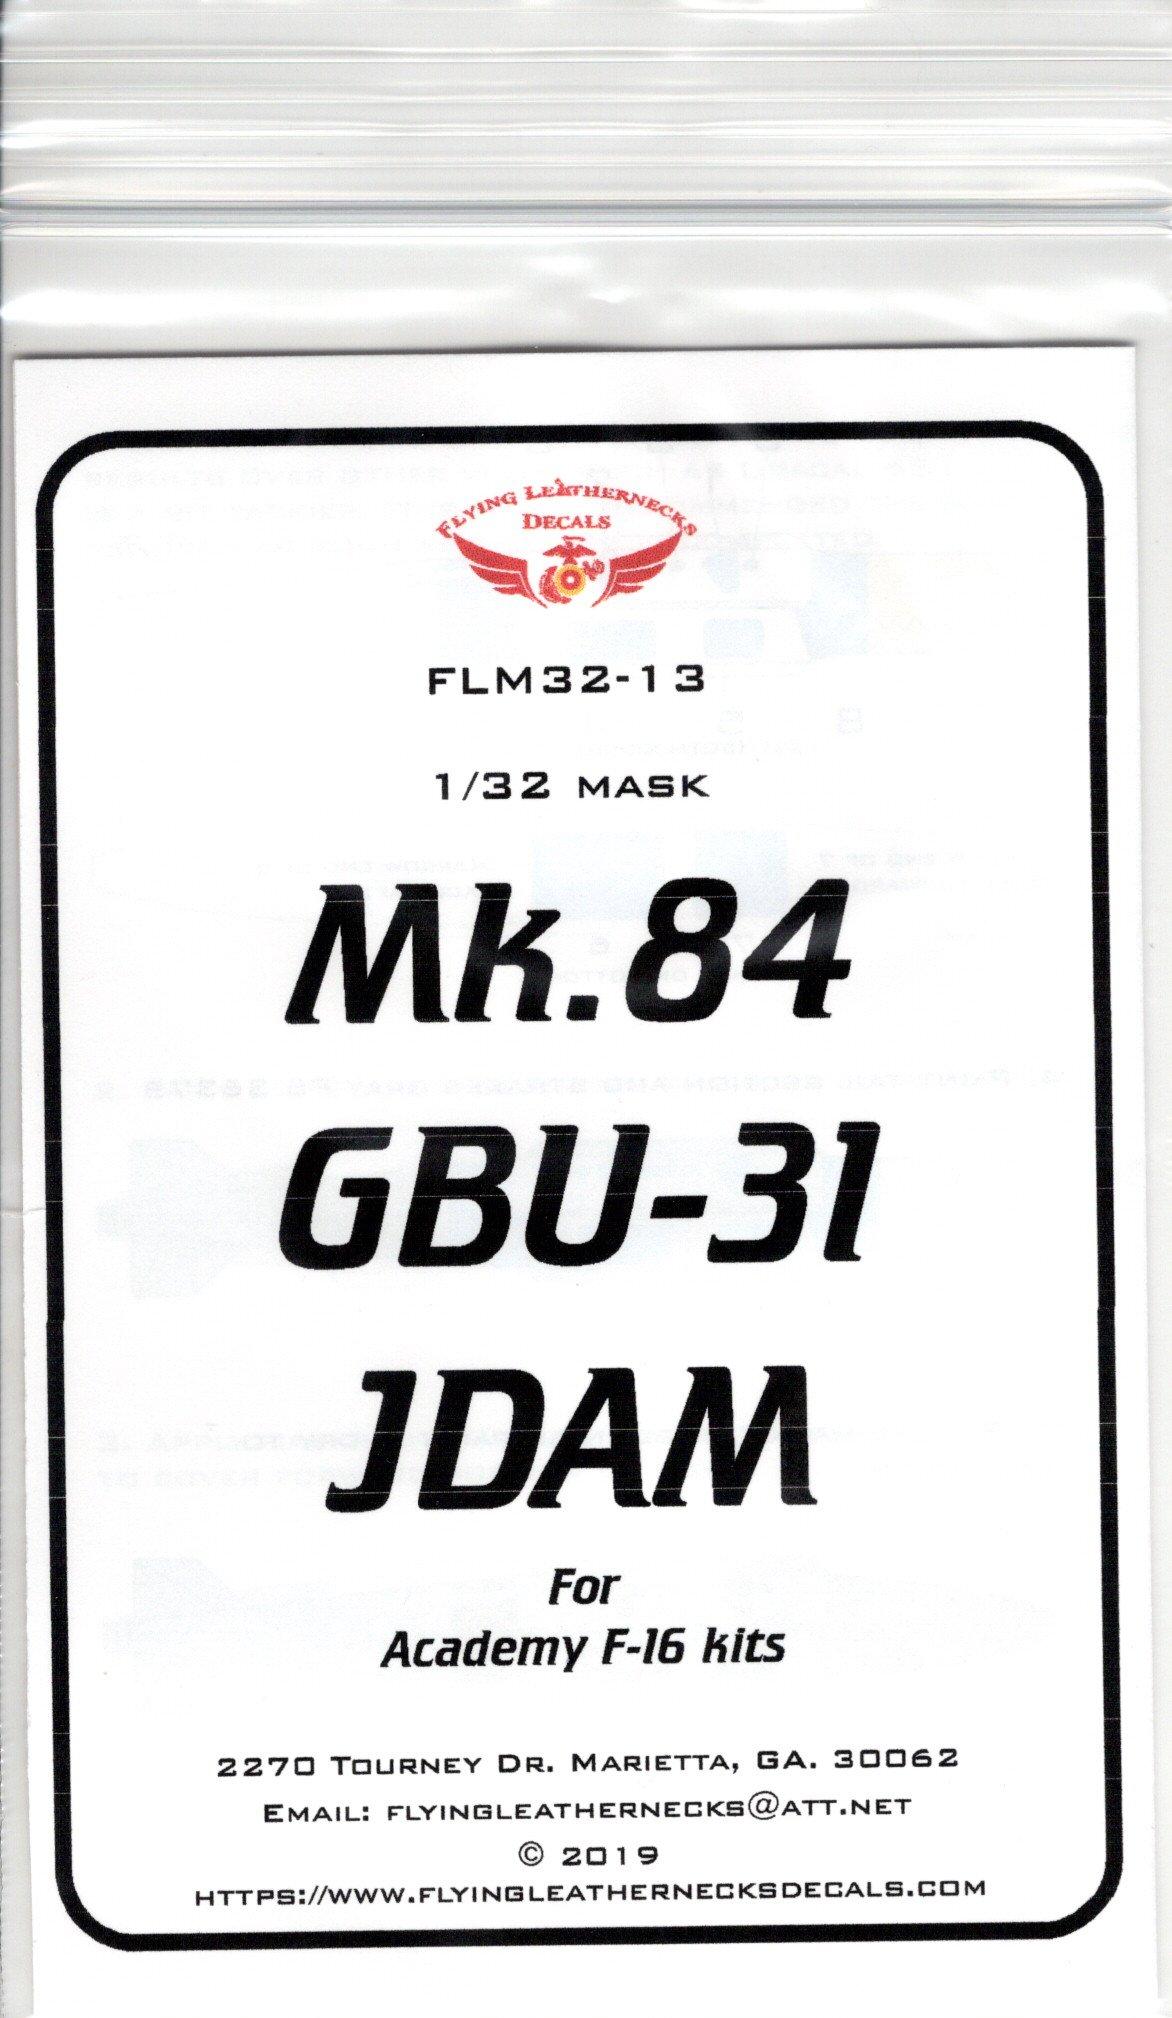 FLM32-13